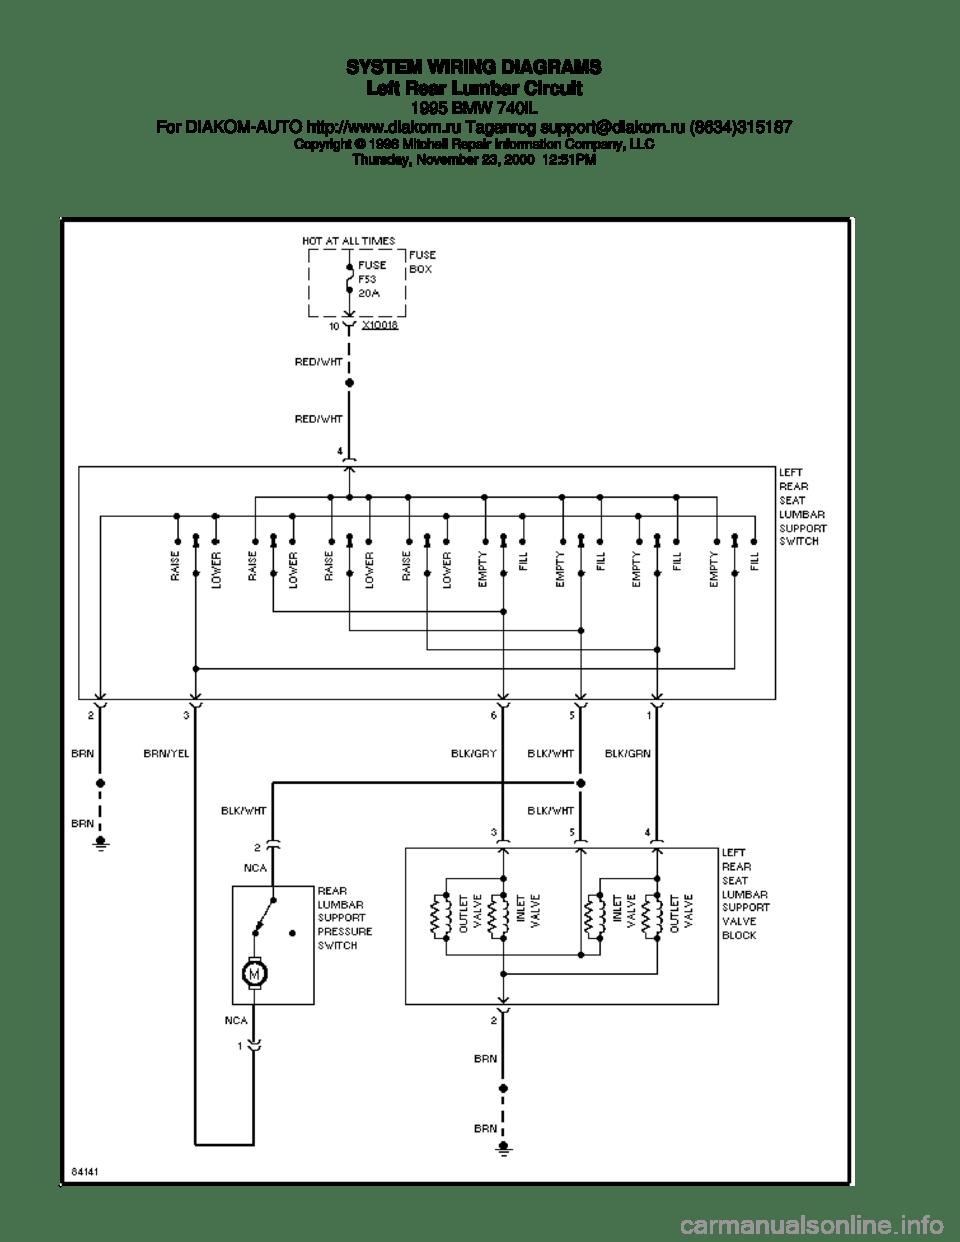 hight resolution of e38 fuse box diagram bmw fuse diagram fuse in circuit diagram e38 trunk fuse box diagram